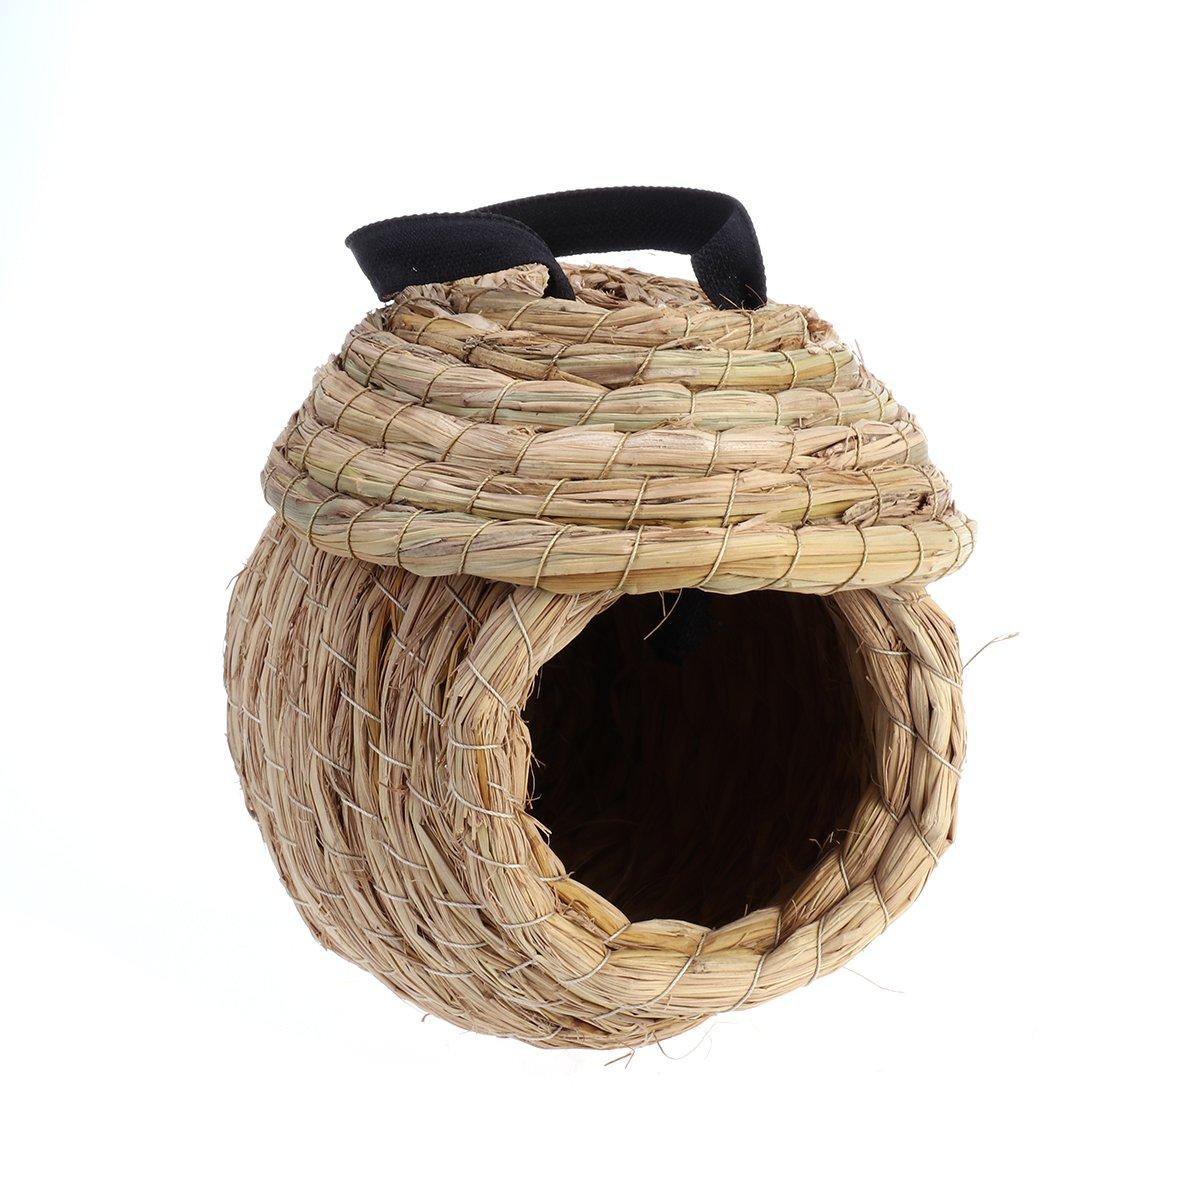 UEETEK Straw Bird Nest Bird House Hut Parrot Hammock Hamster Gerbil Small Animal House Bed